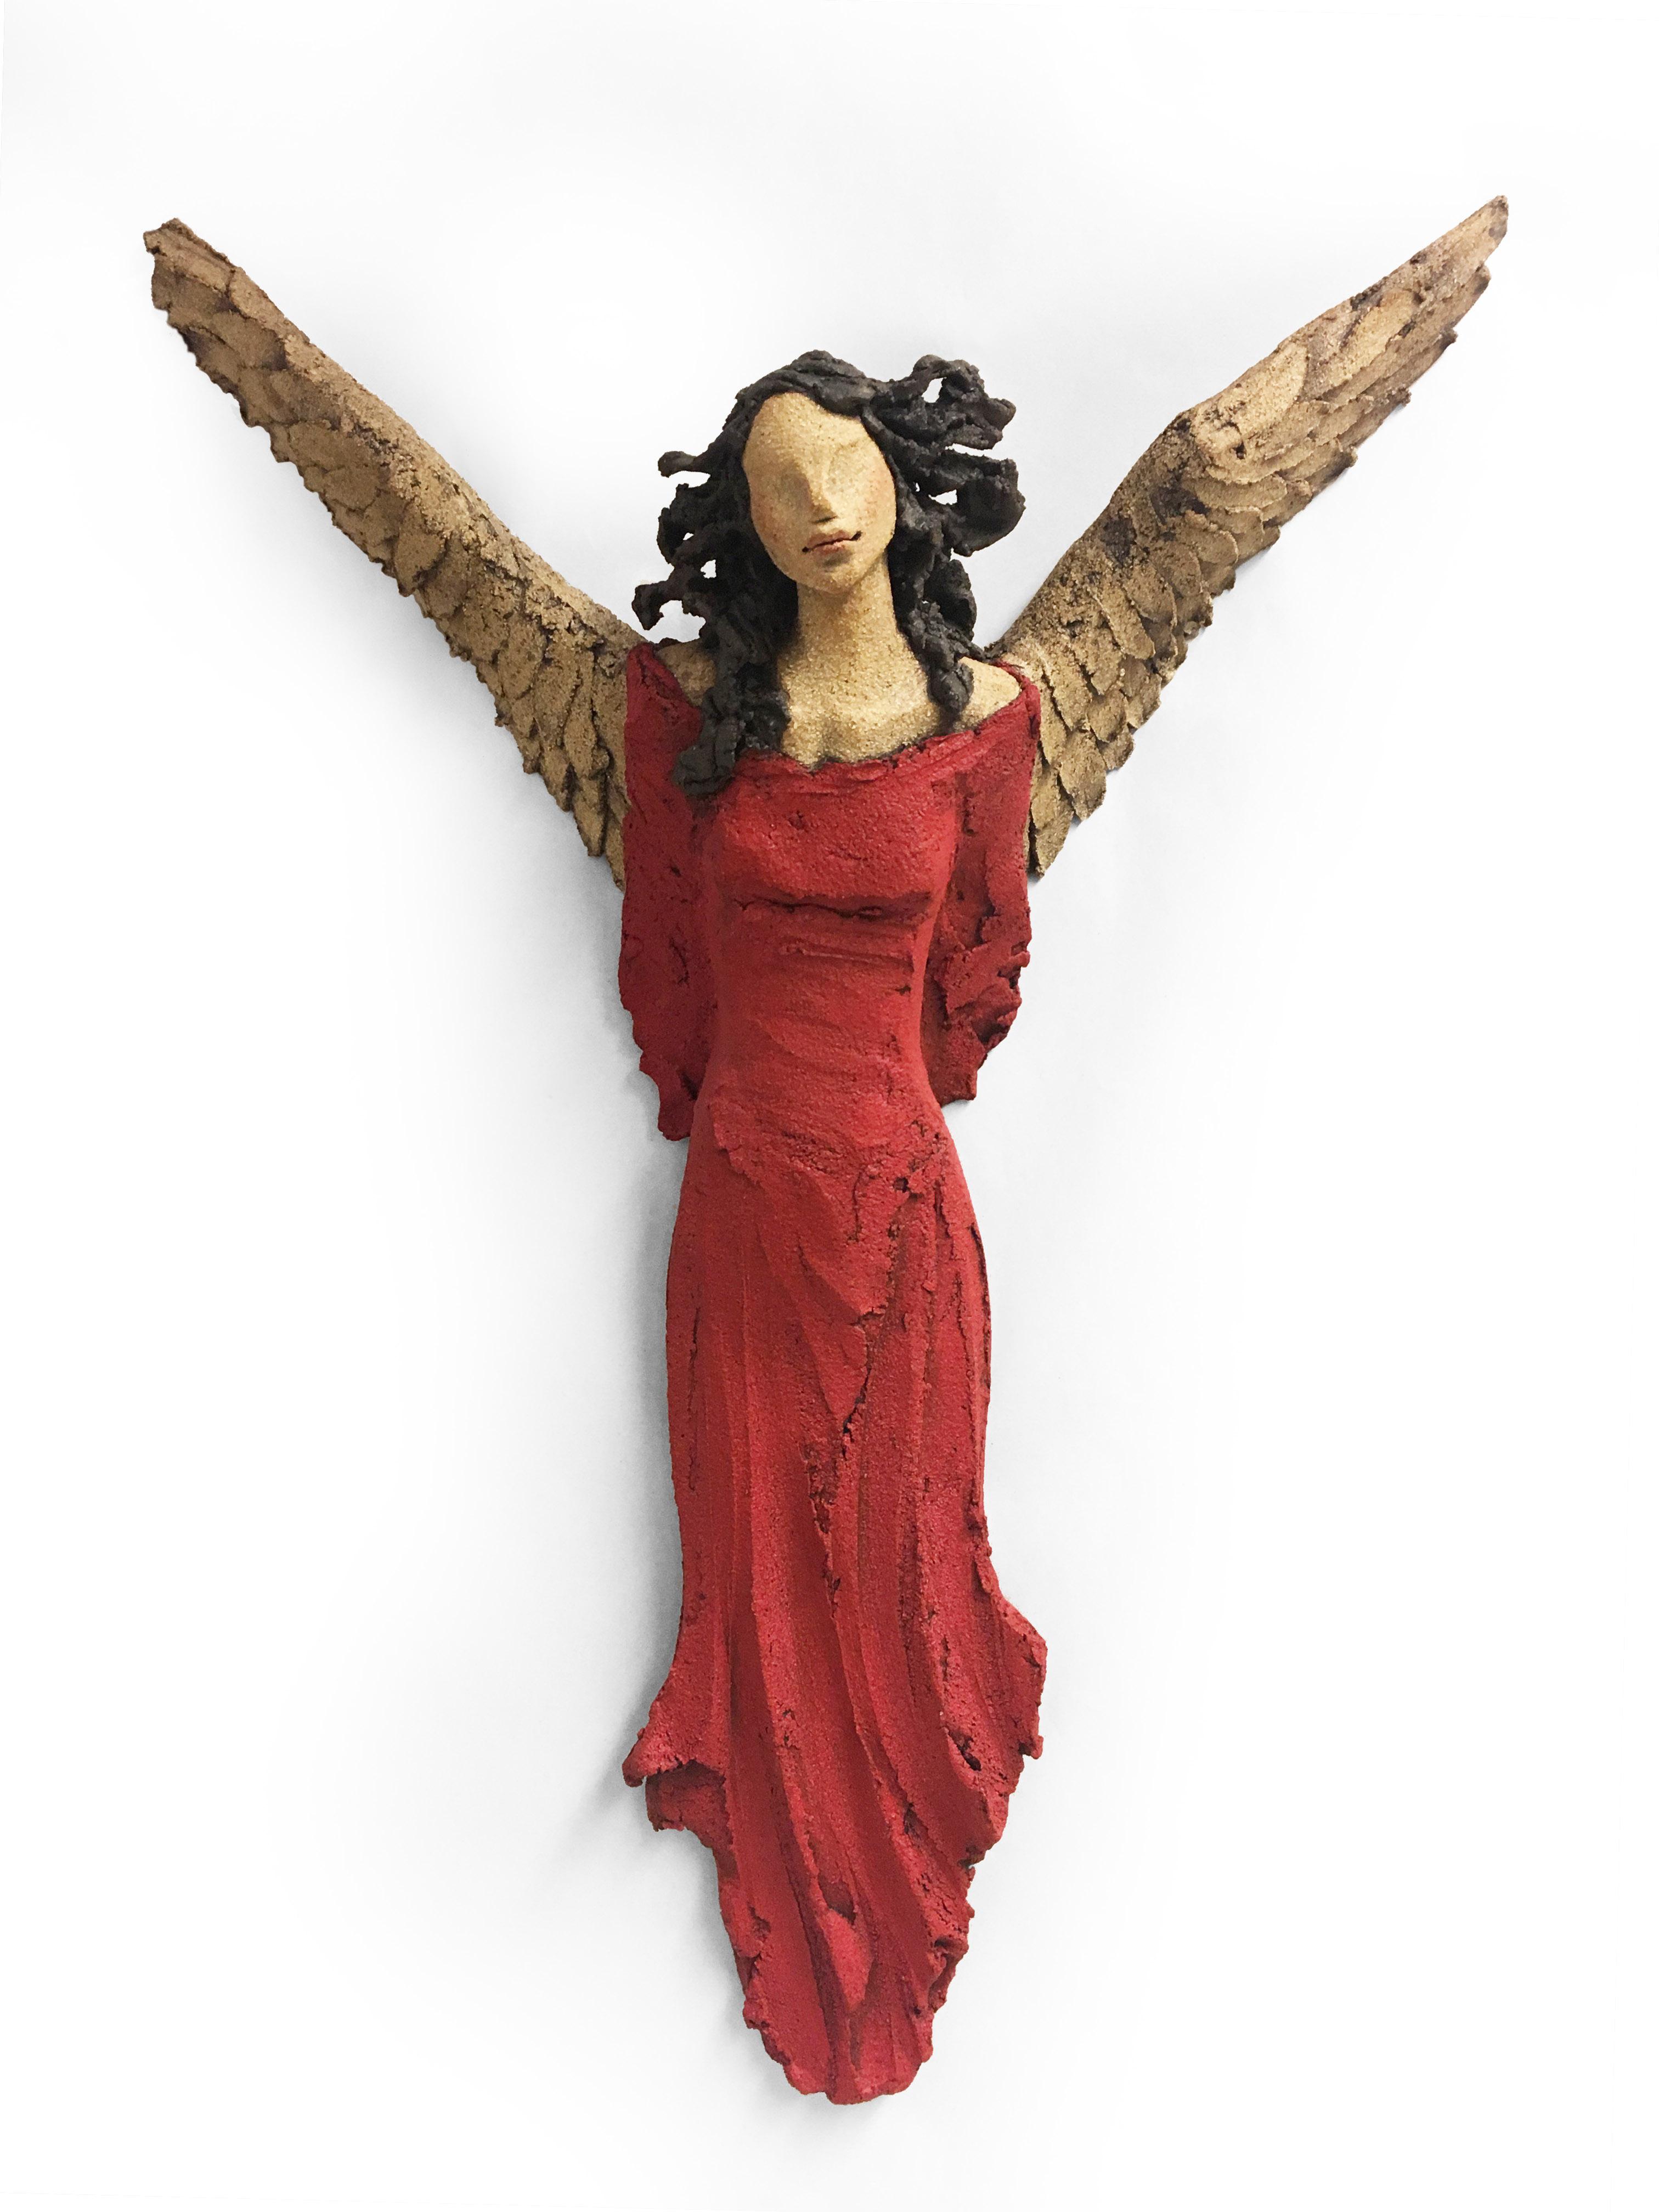 Engel, veggengel, skulptur, keramikk, Ingun Dahlin